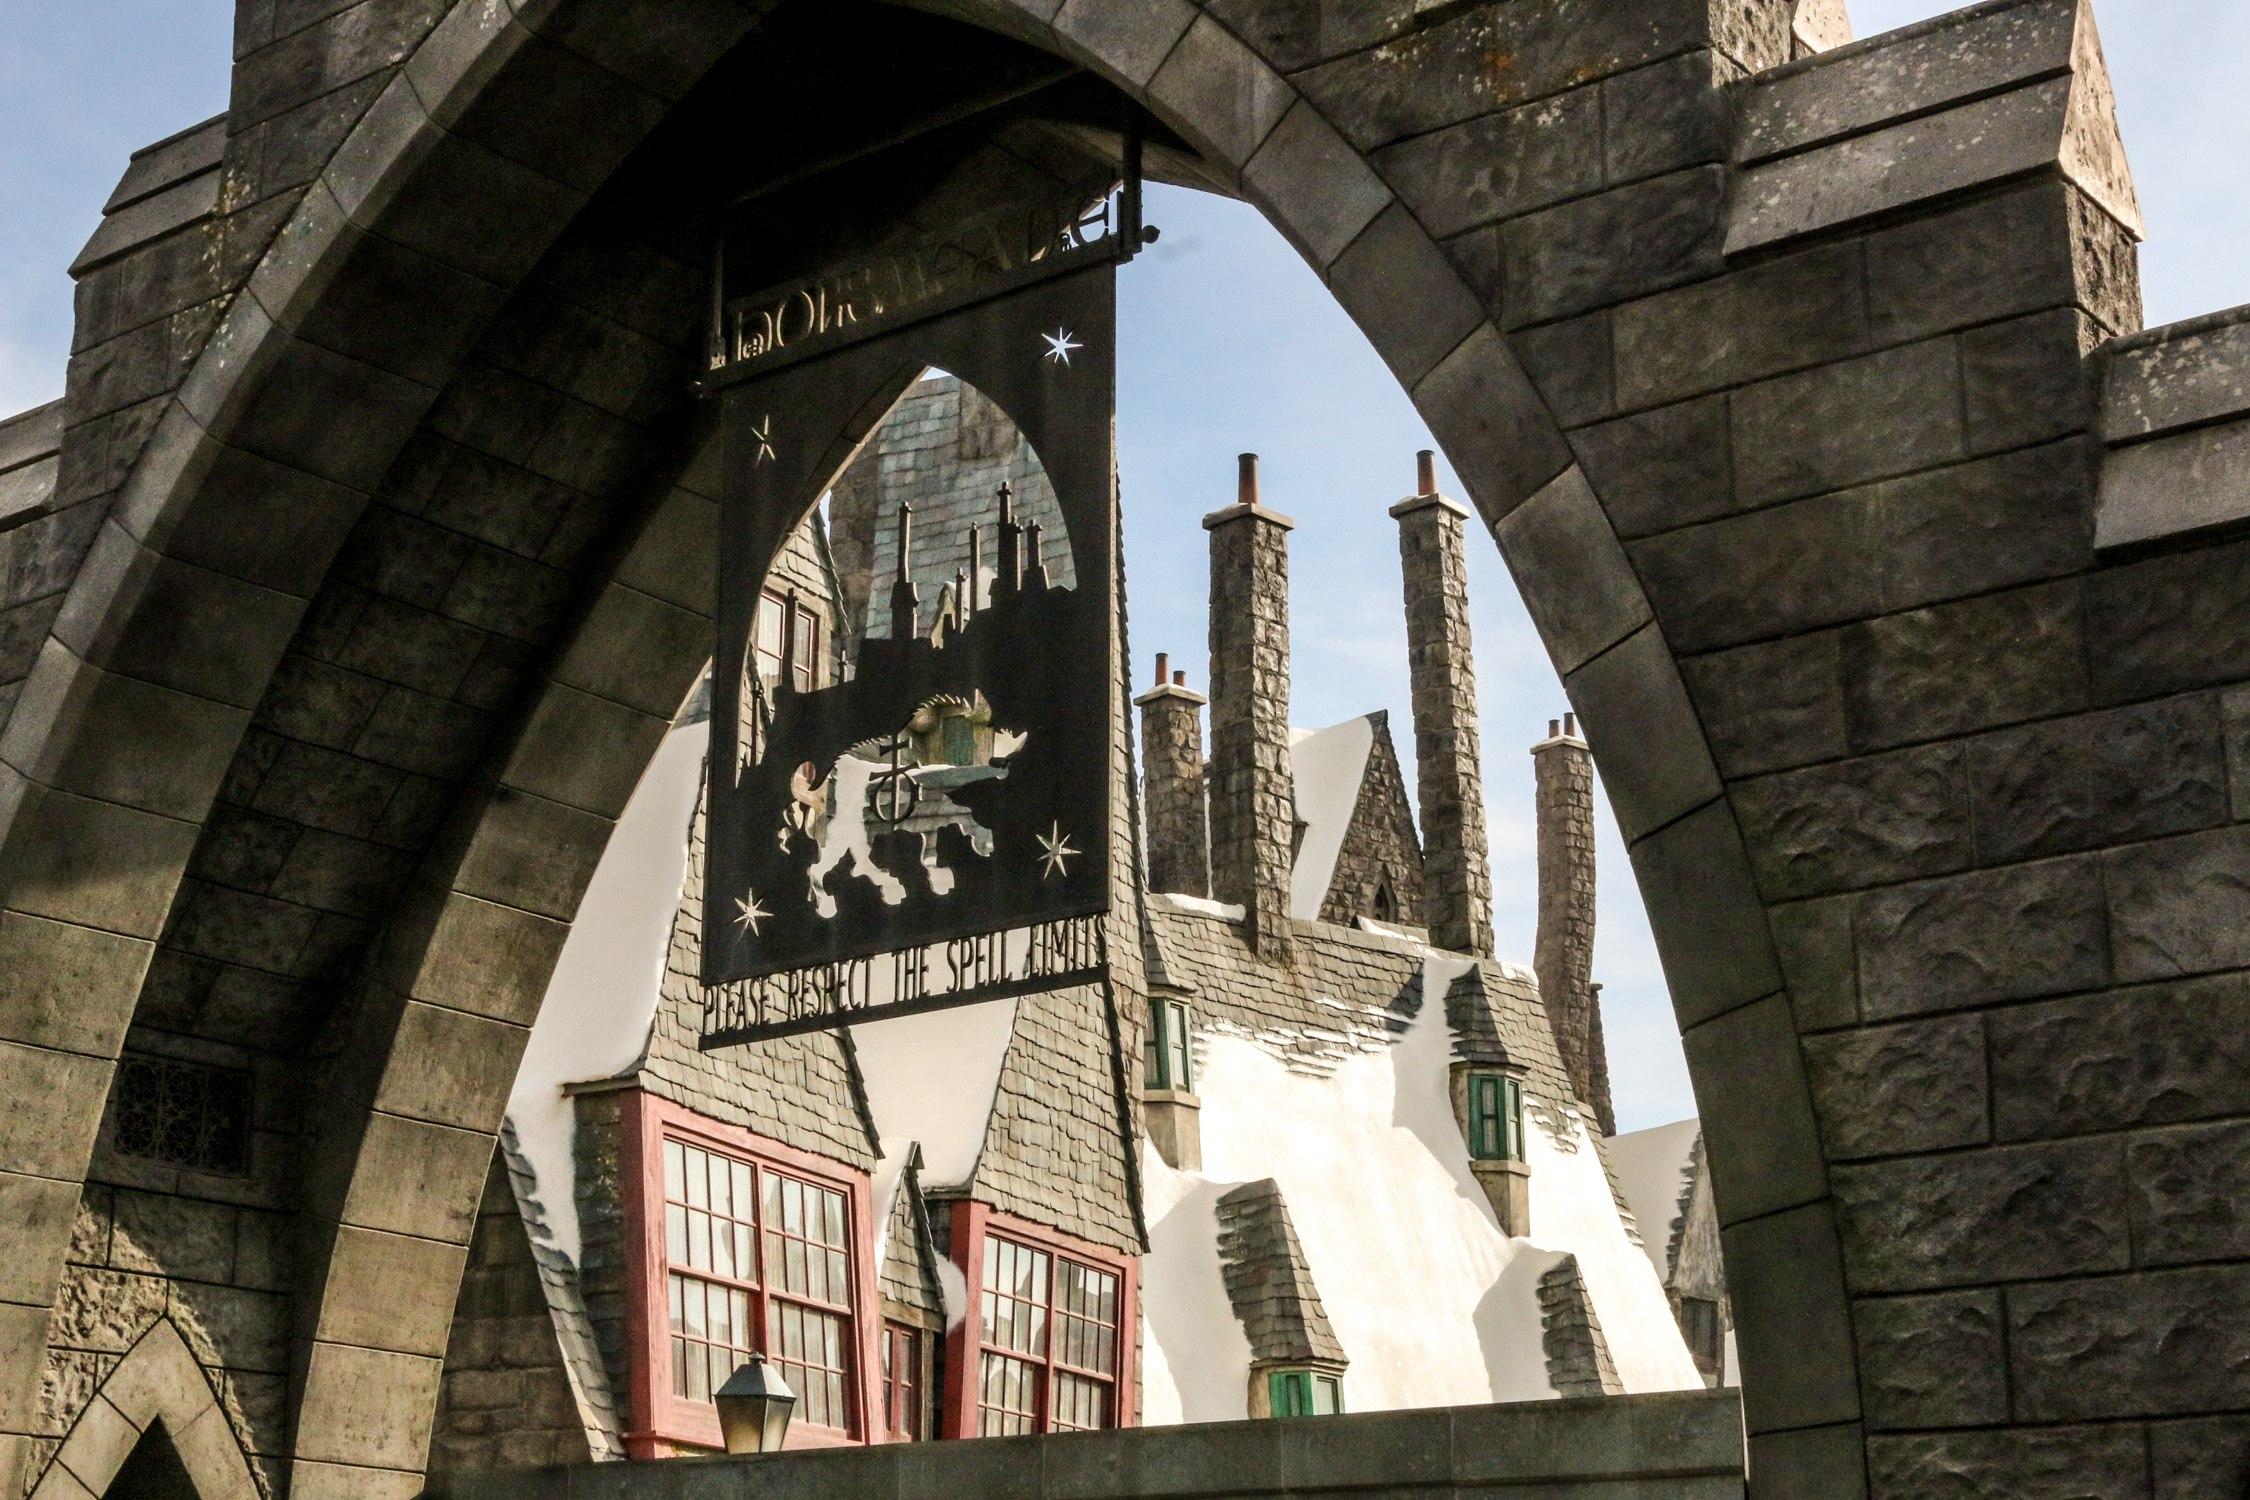 Entertainment Weekly presents Potter Sneak Peek